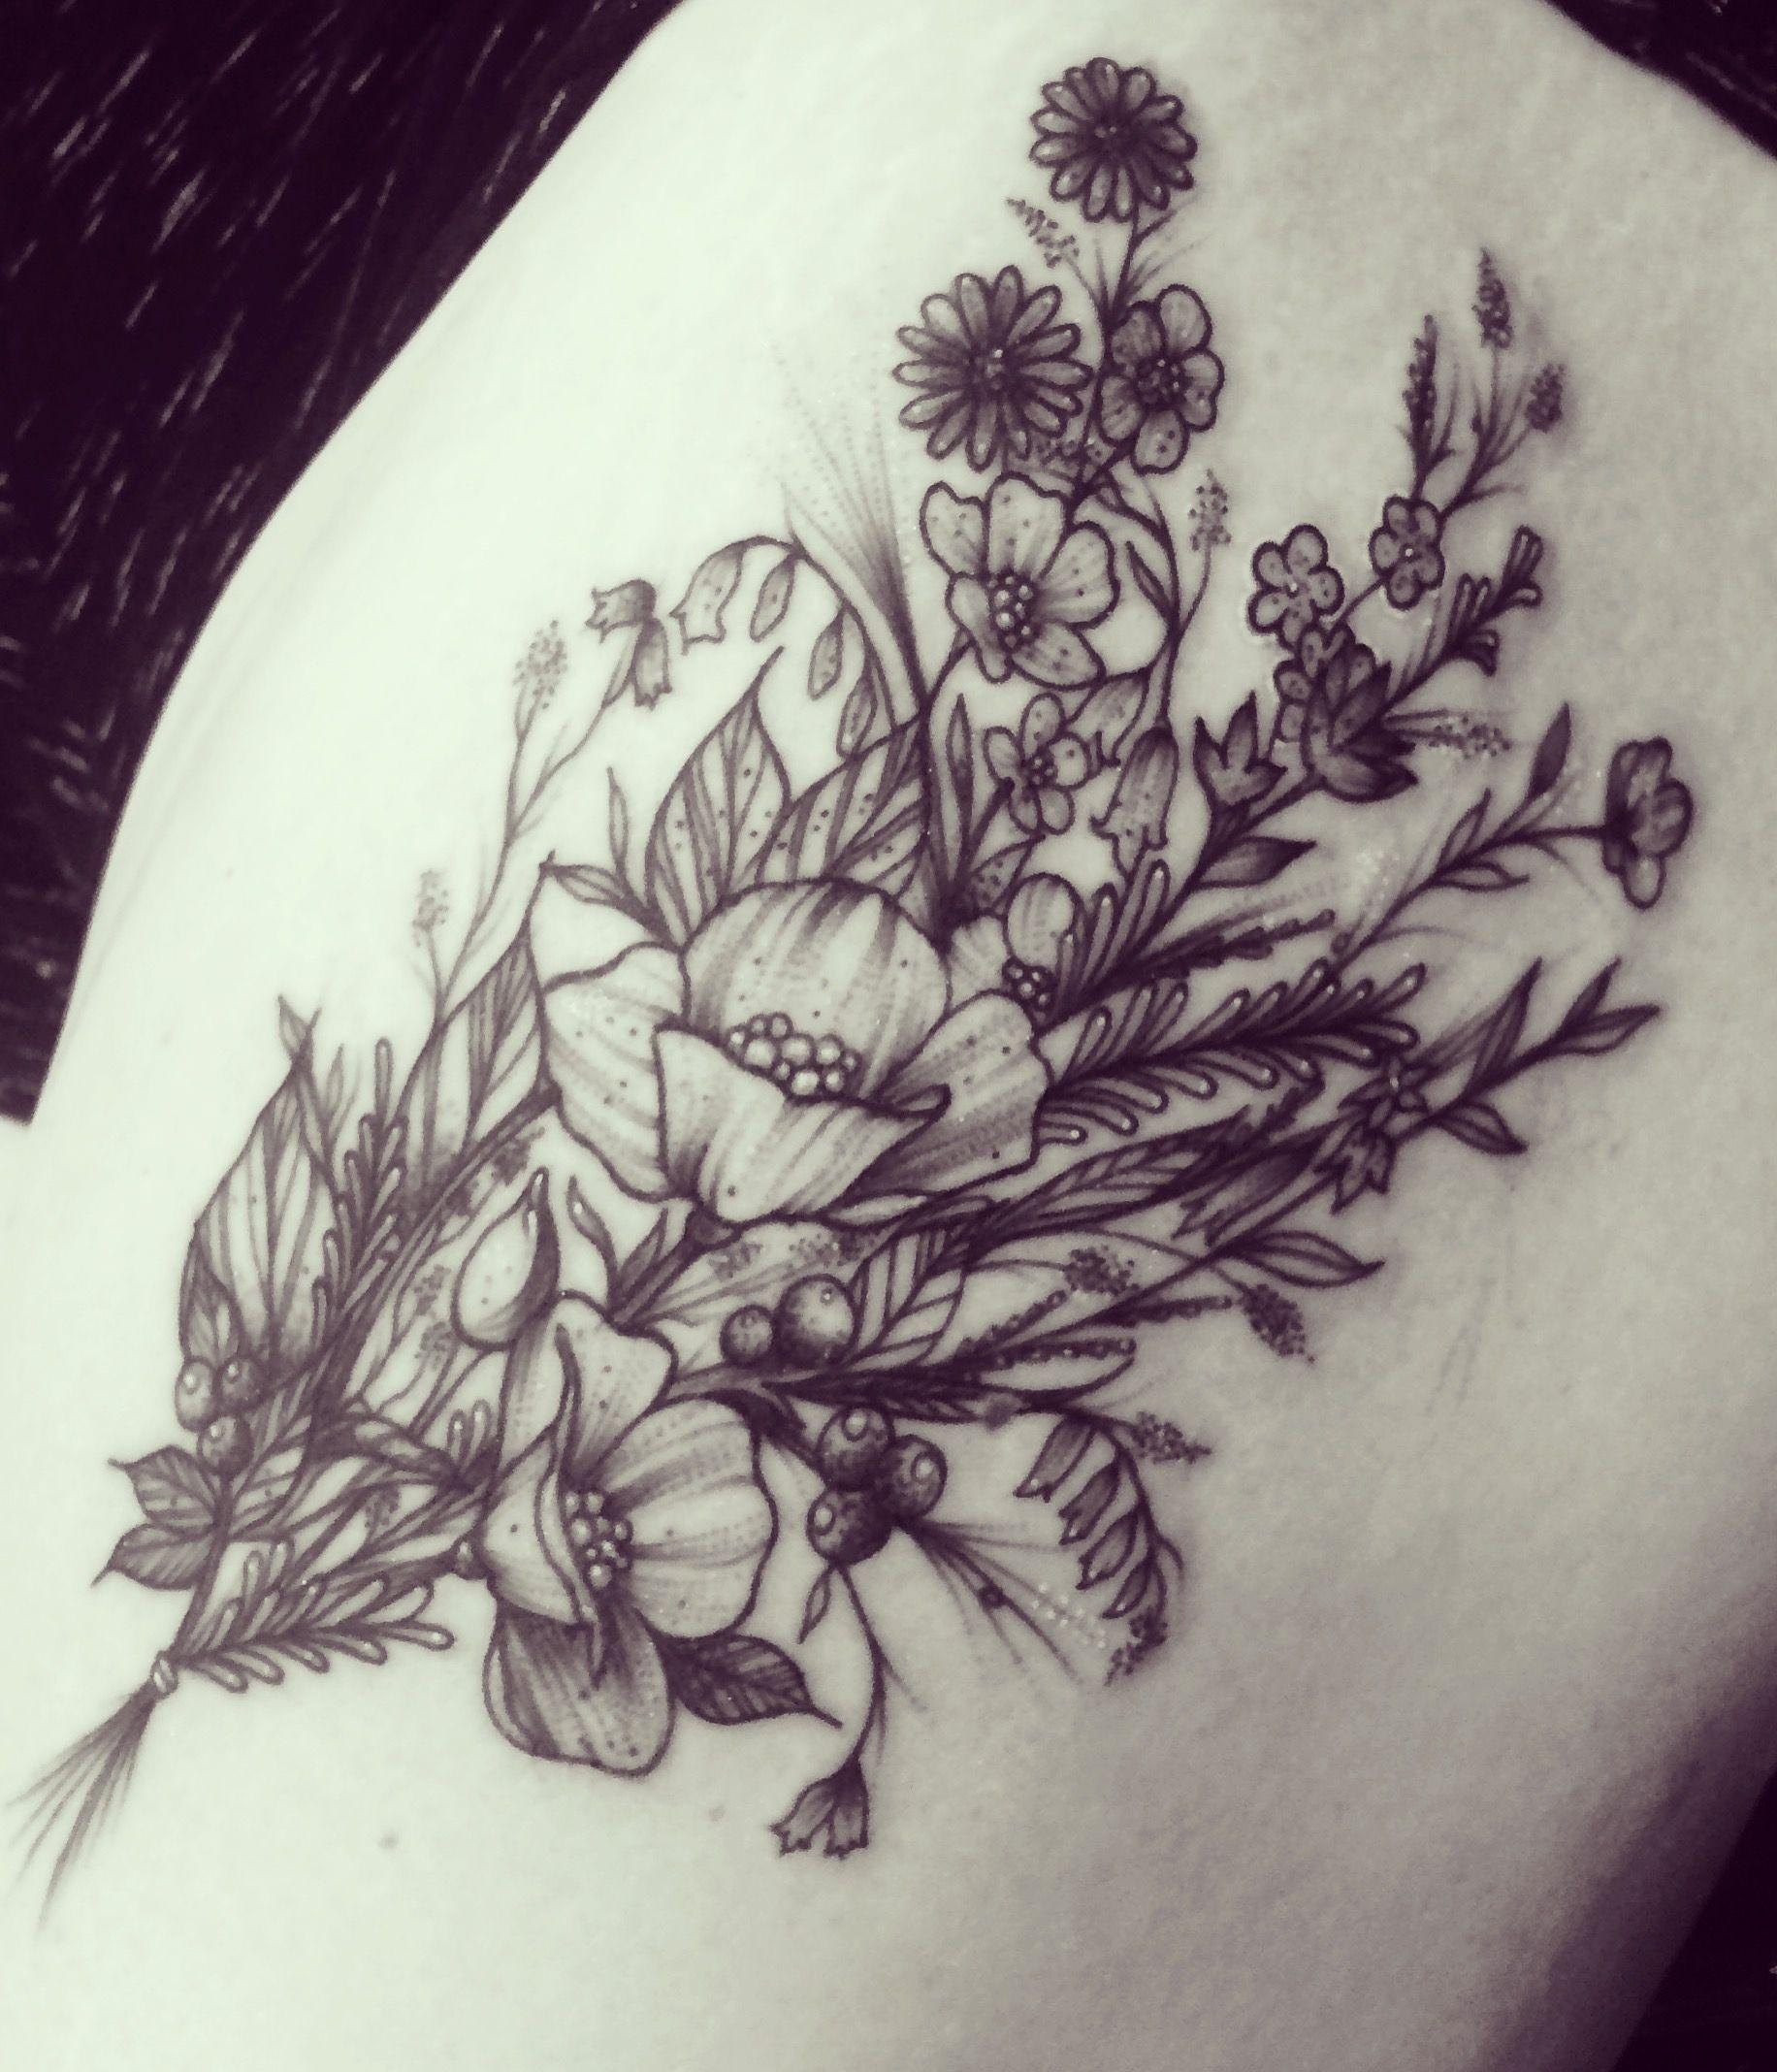 Flower tattoo wildflower thigh tattoo black and white floral flower tattoo wildflower thigh tattoo black and white floral tattoo womens tattoo dhlflorist Images